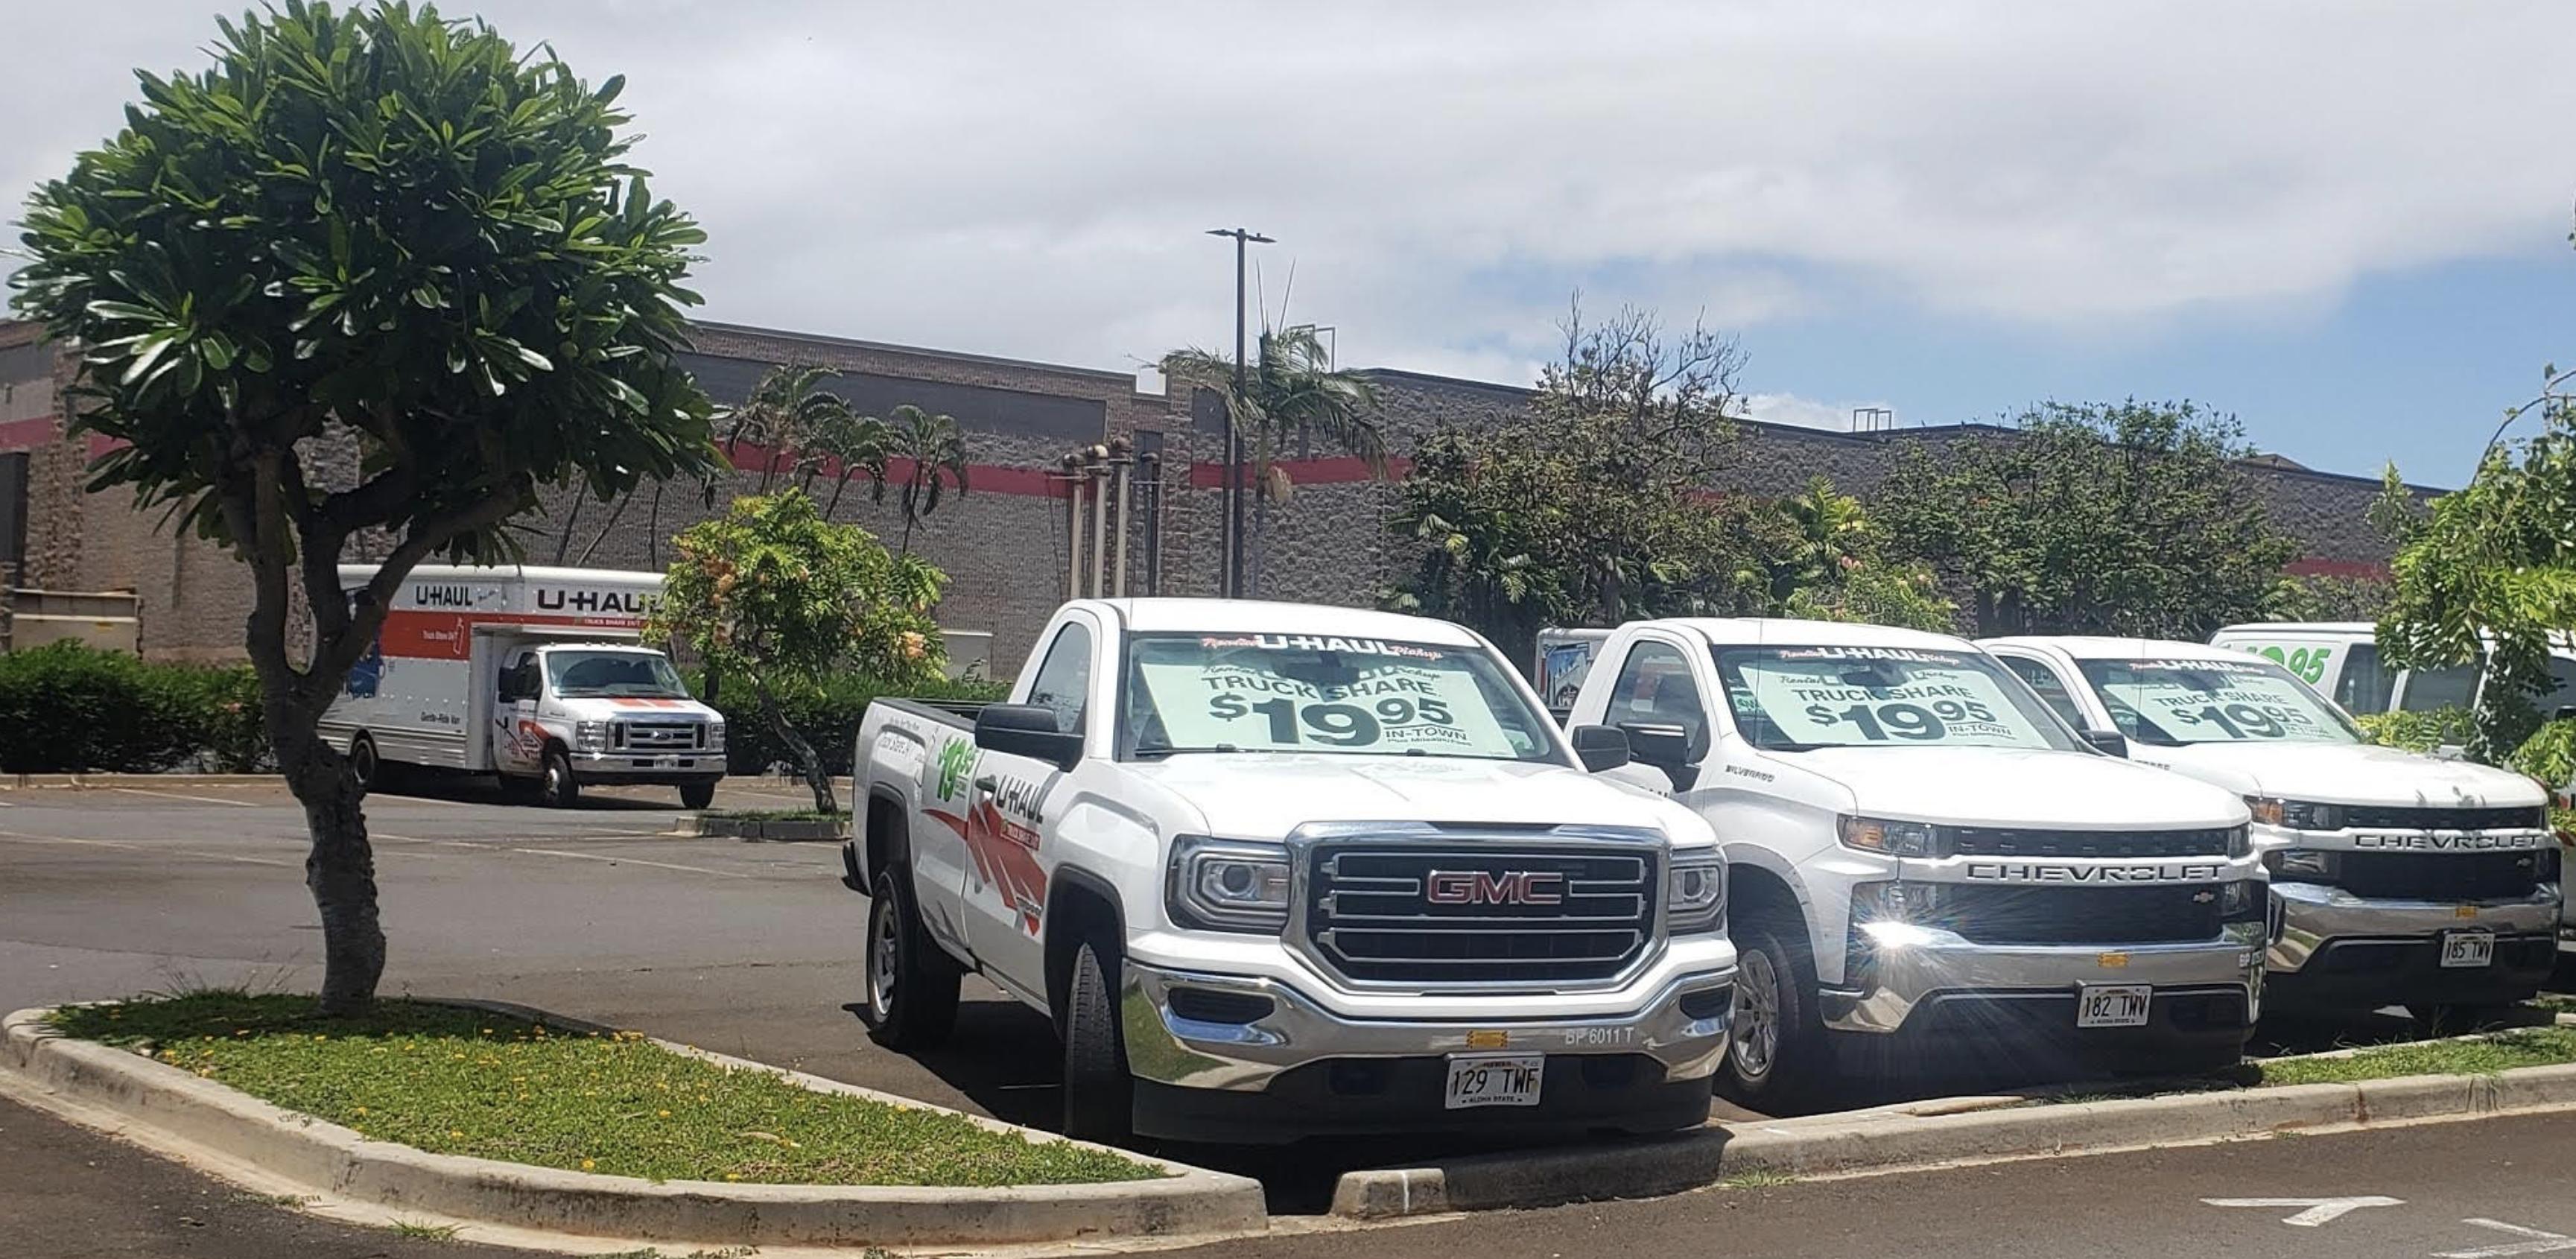 U-Haul Offers 30 Days Free Self-Storage to Hawai'i Flood Victims